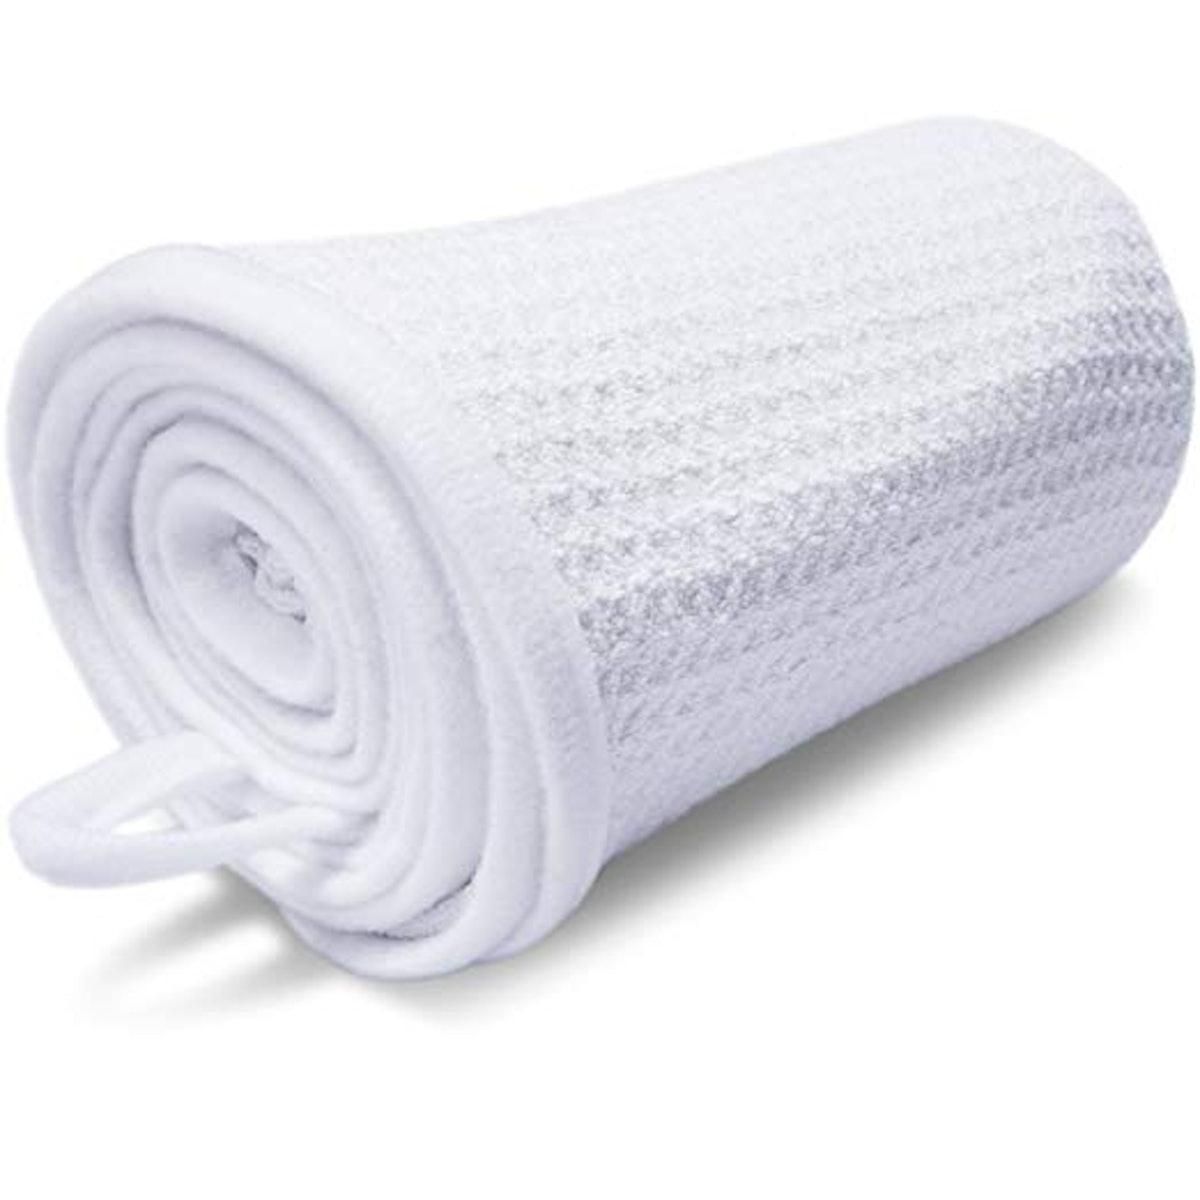 Desired Body Microfiber Hair Towel